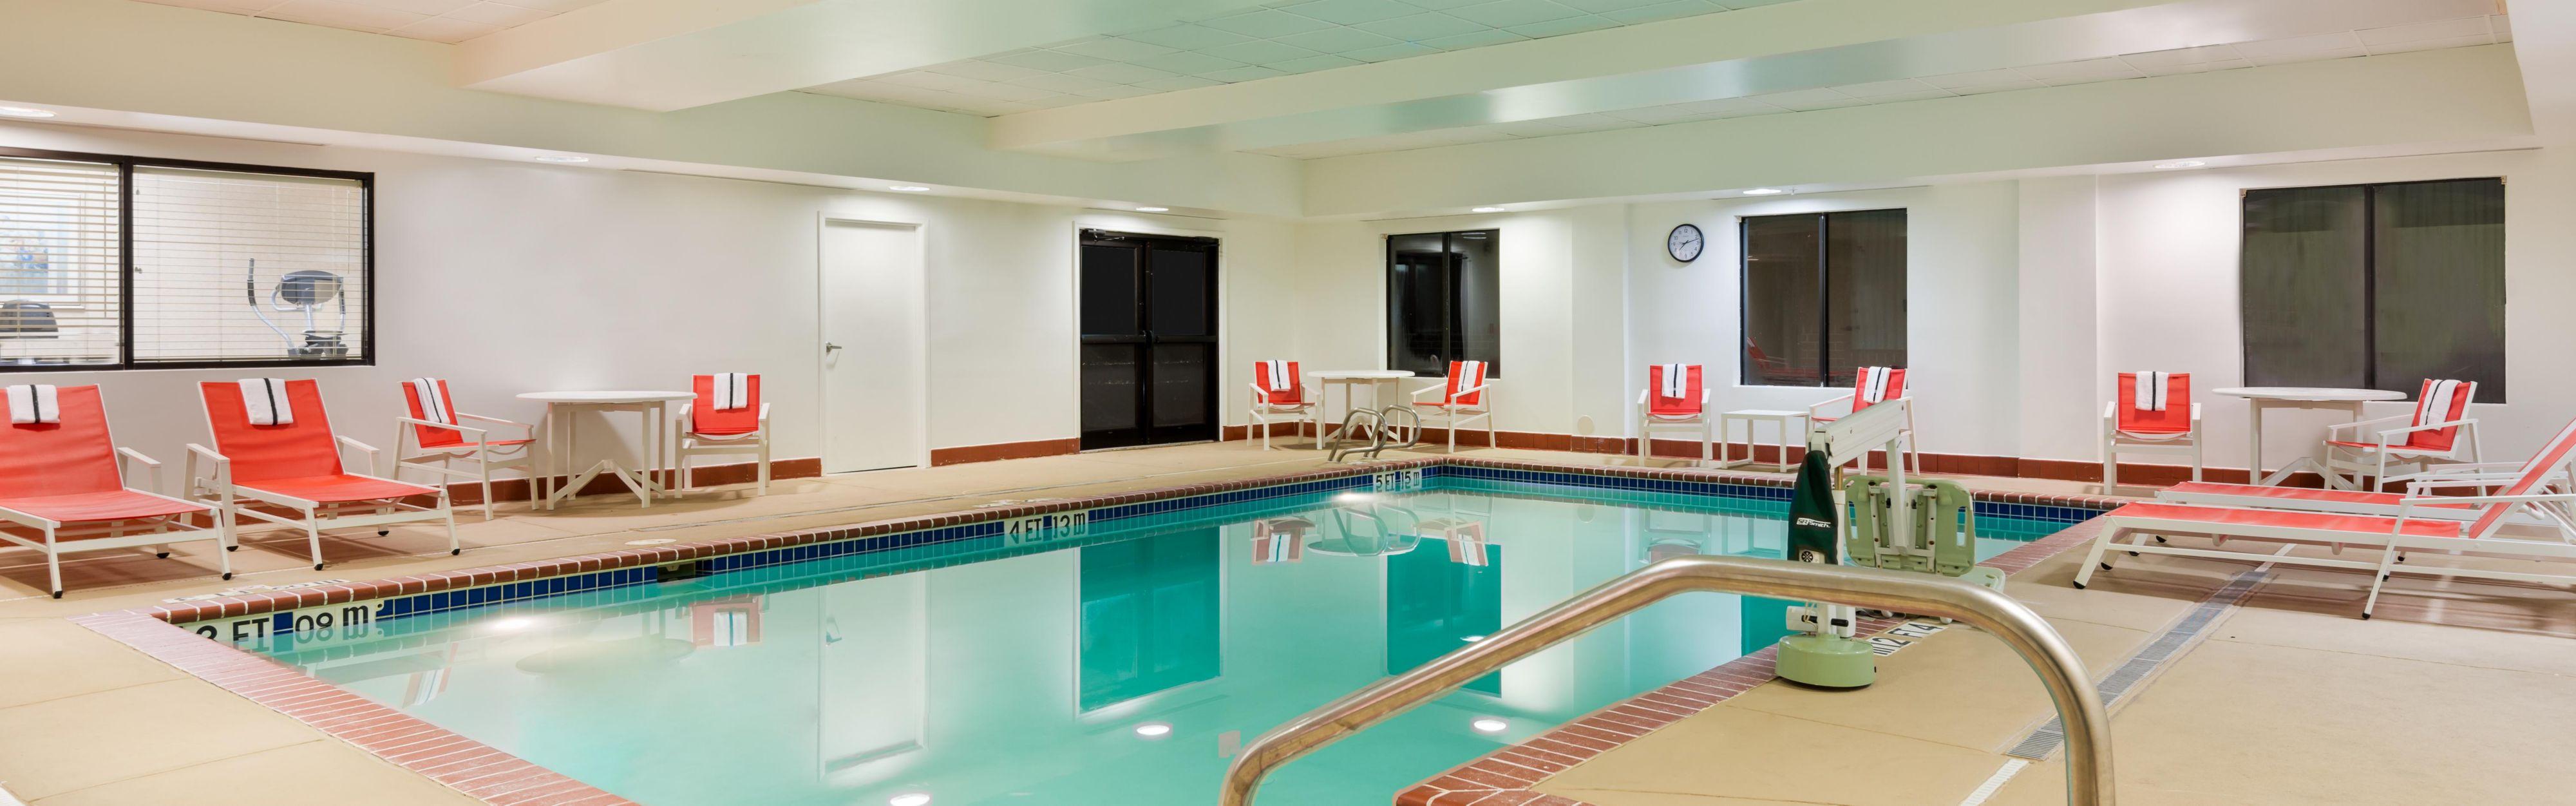 Holiday Inn Express & Suites Richmond North Ashland image 2